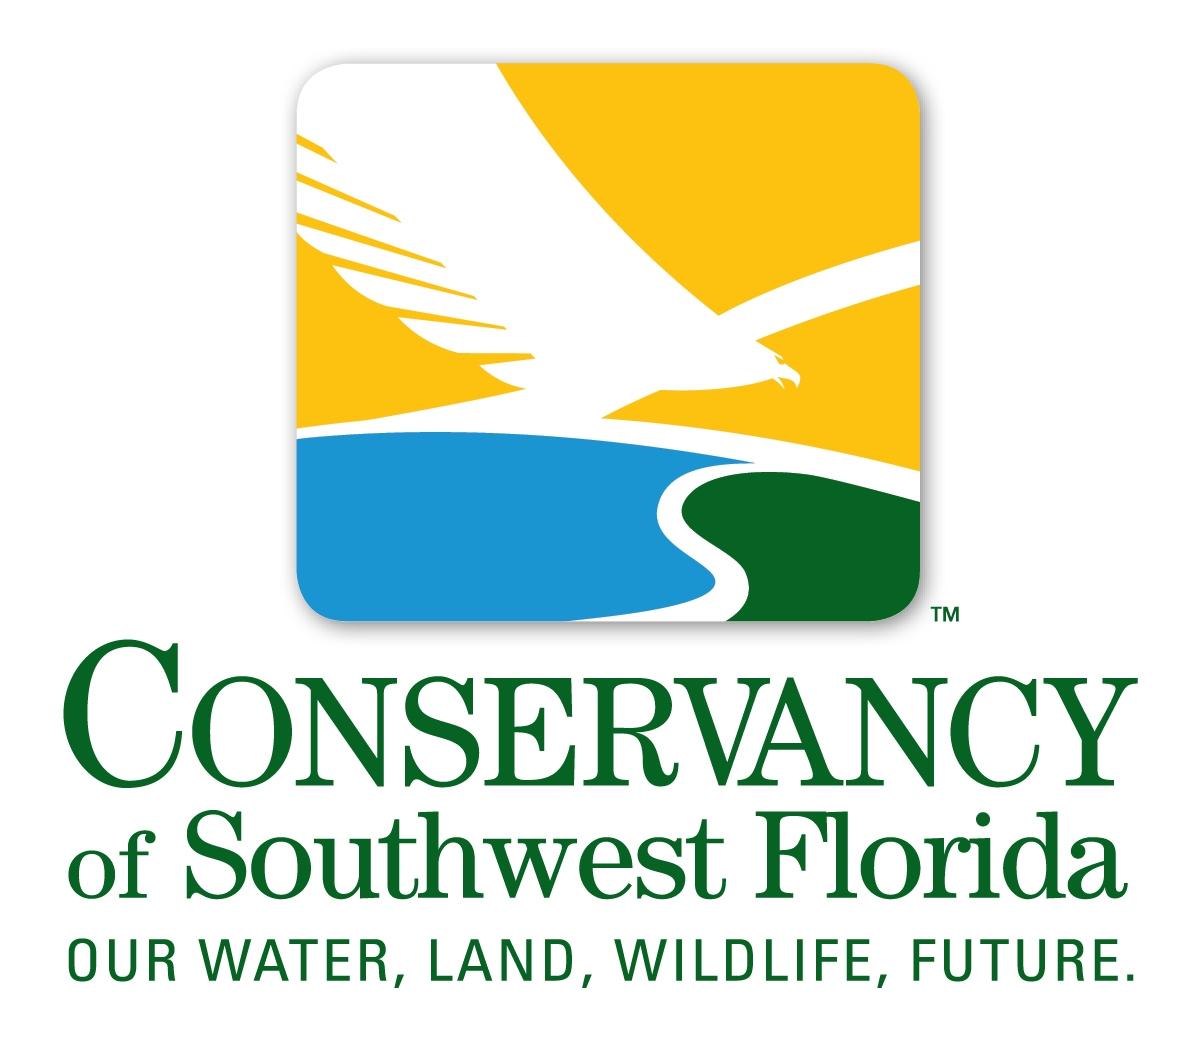 https://www.joshswaterjobs.com/wp-content/uploads/2021/06/Conservancy-Logo.jpg